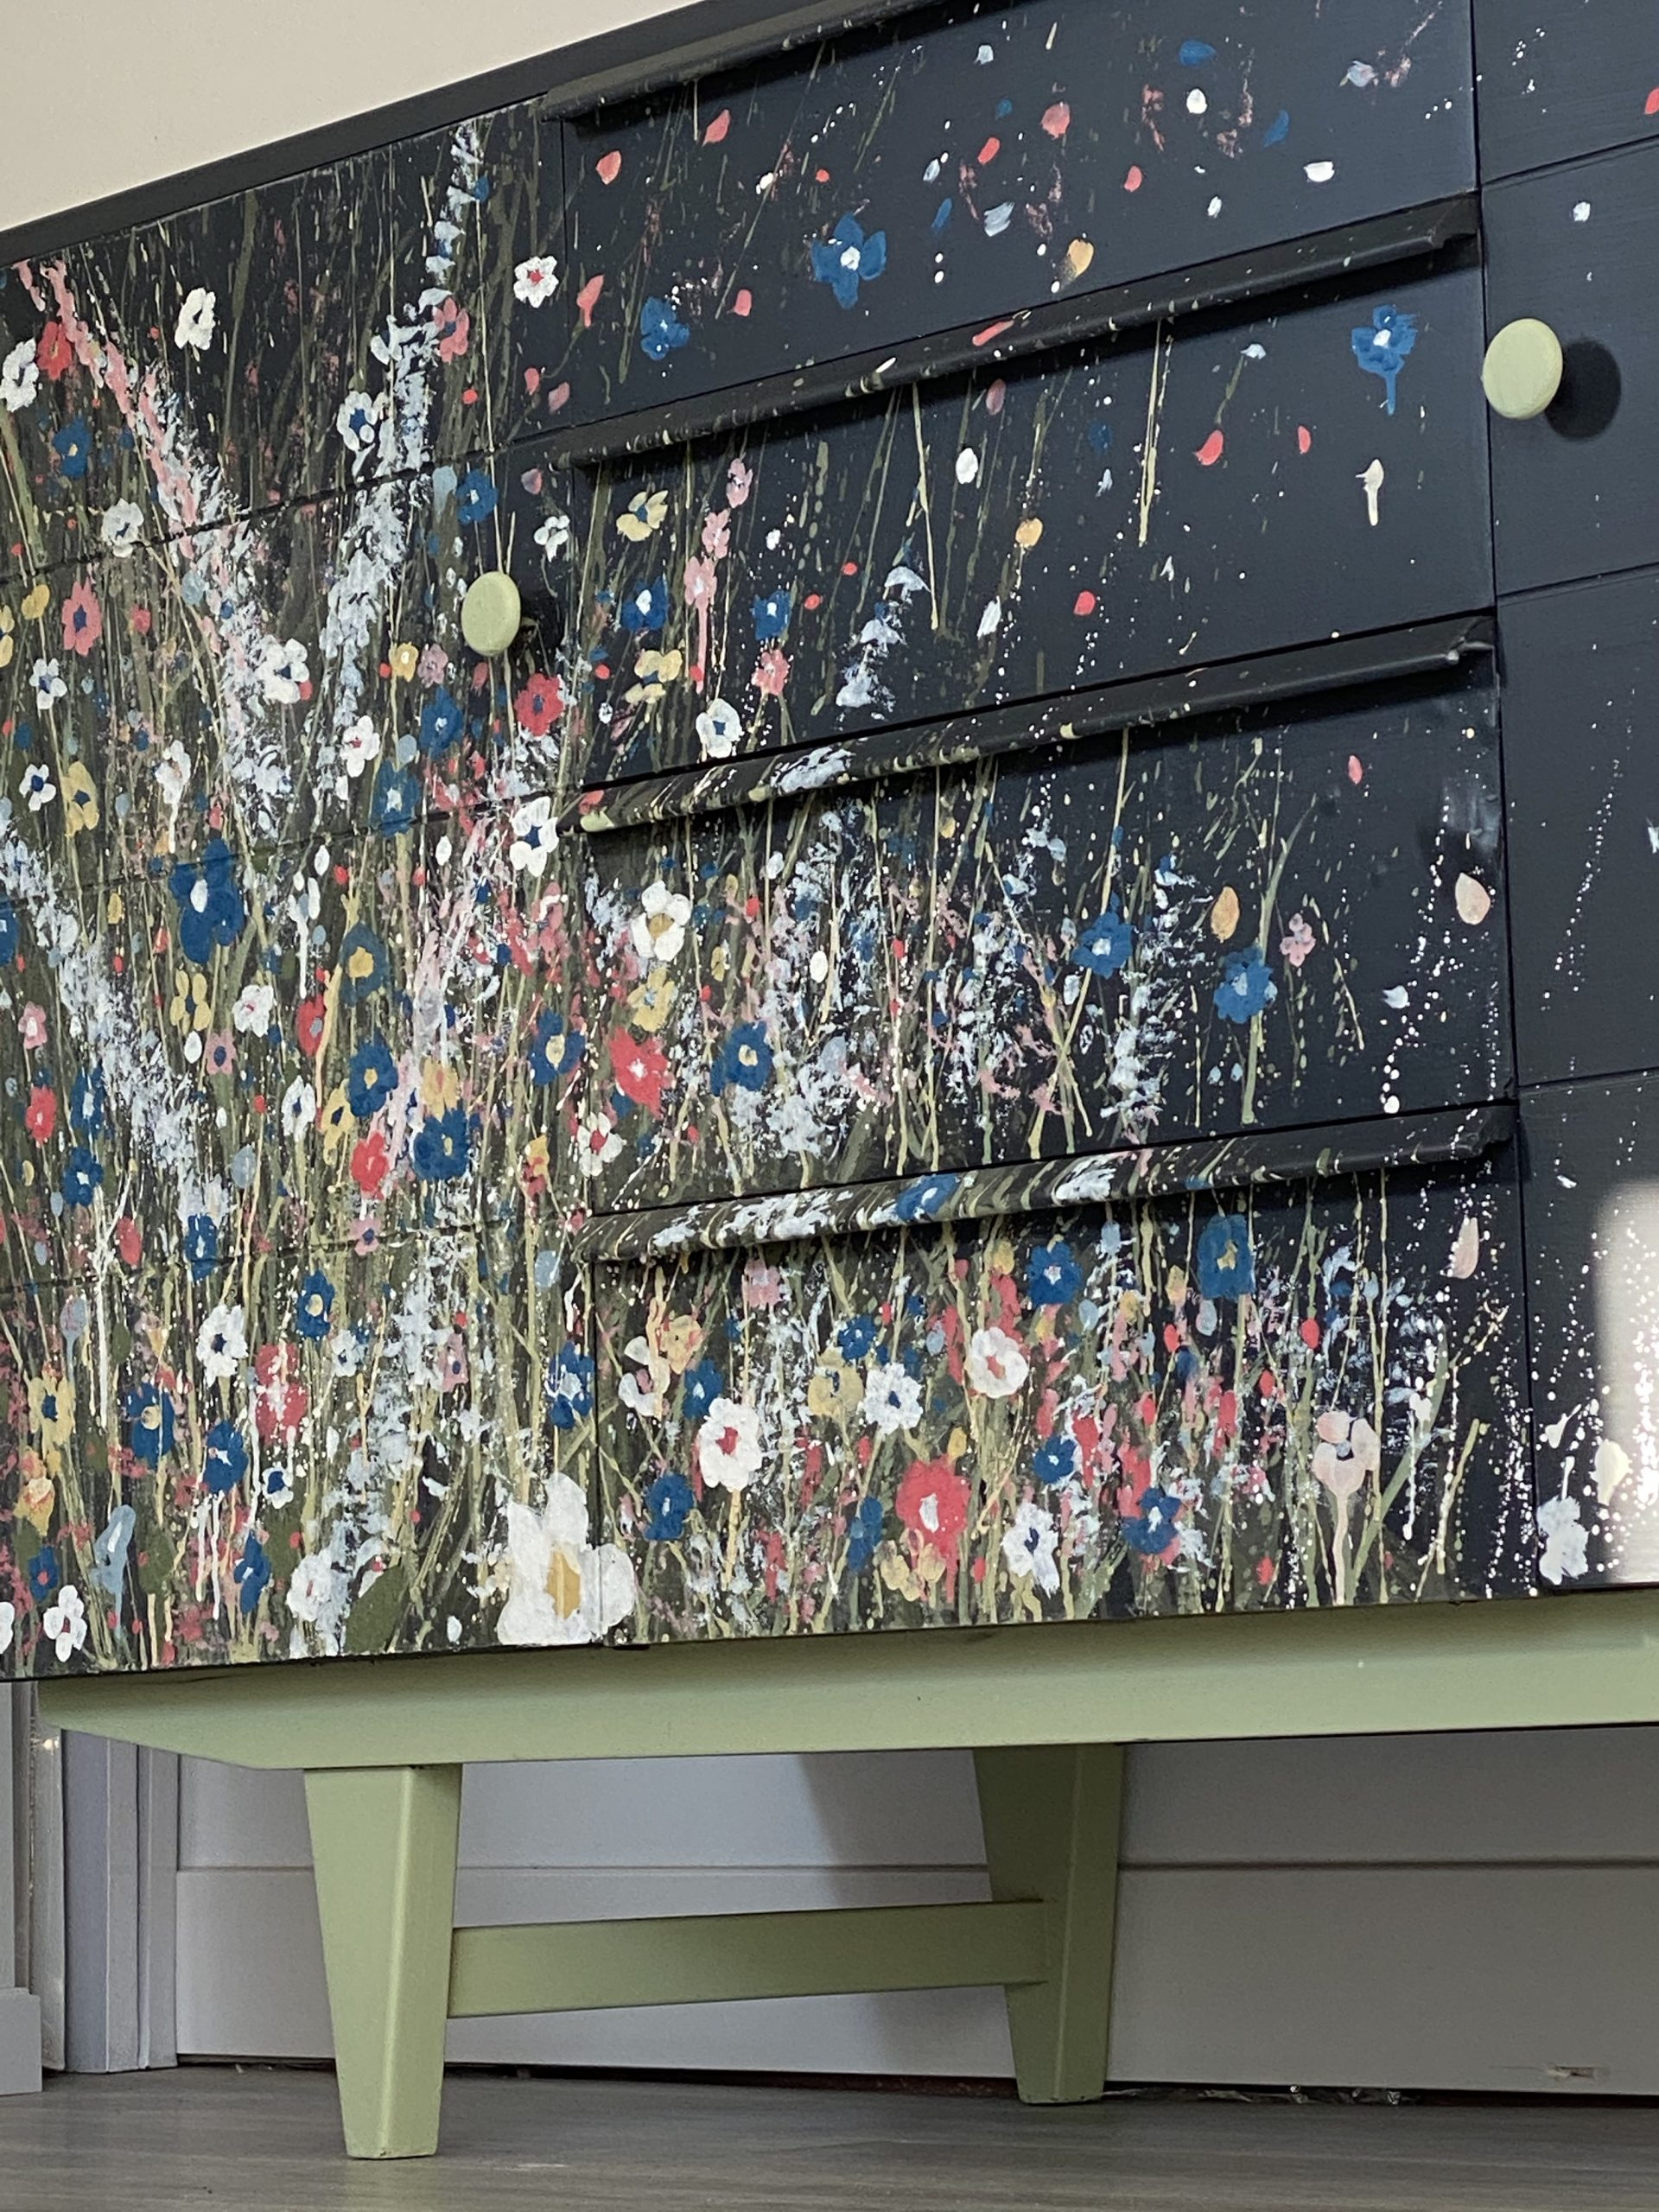 Low view of hand painted milk paint art MCM sideboard